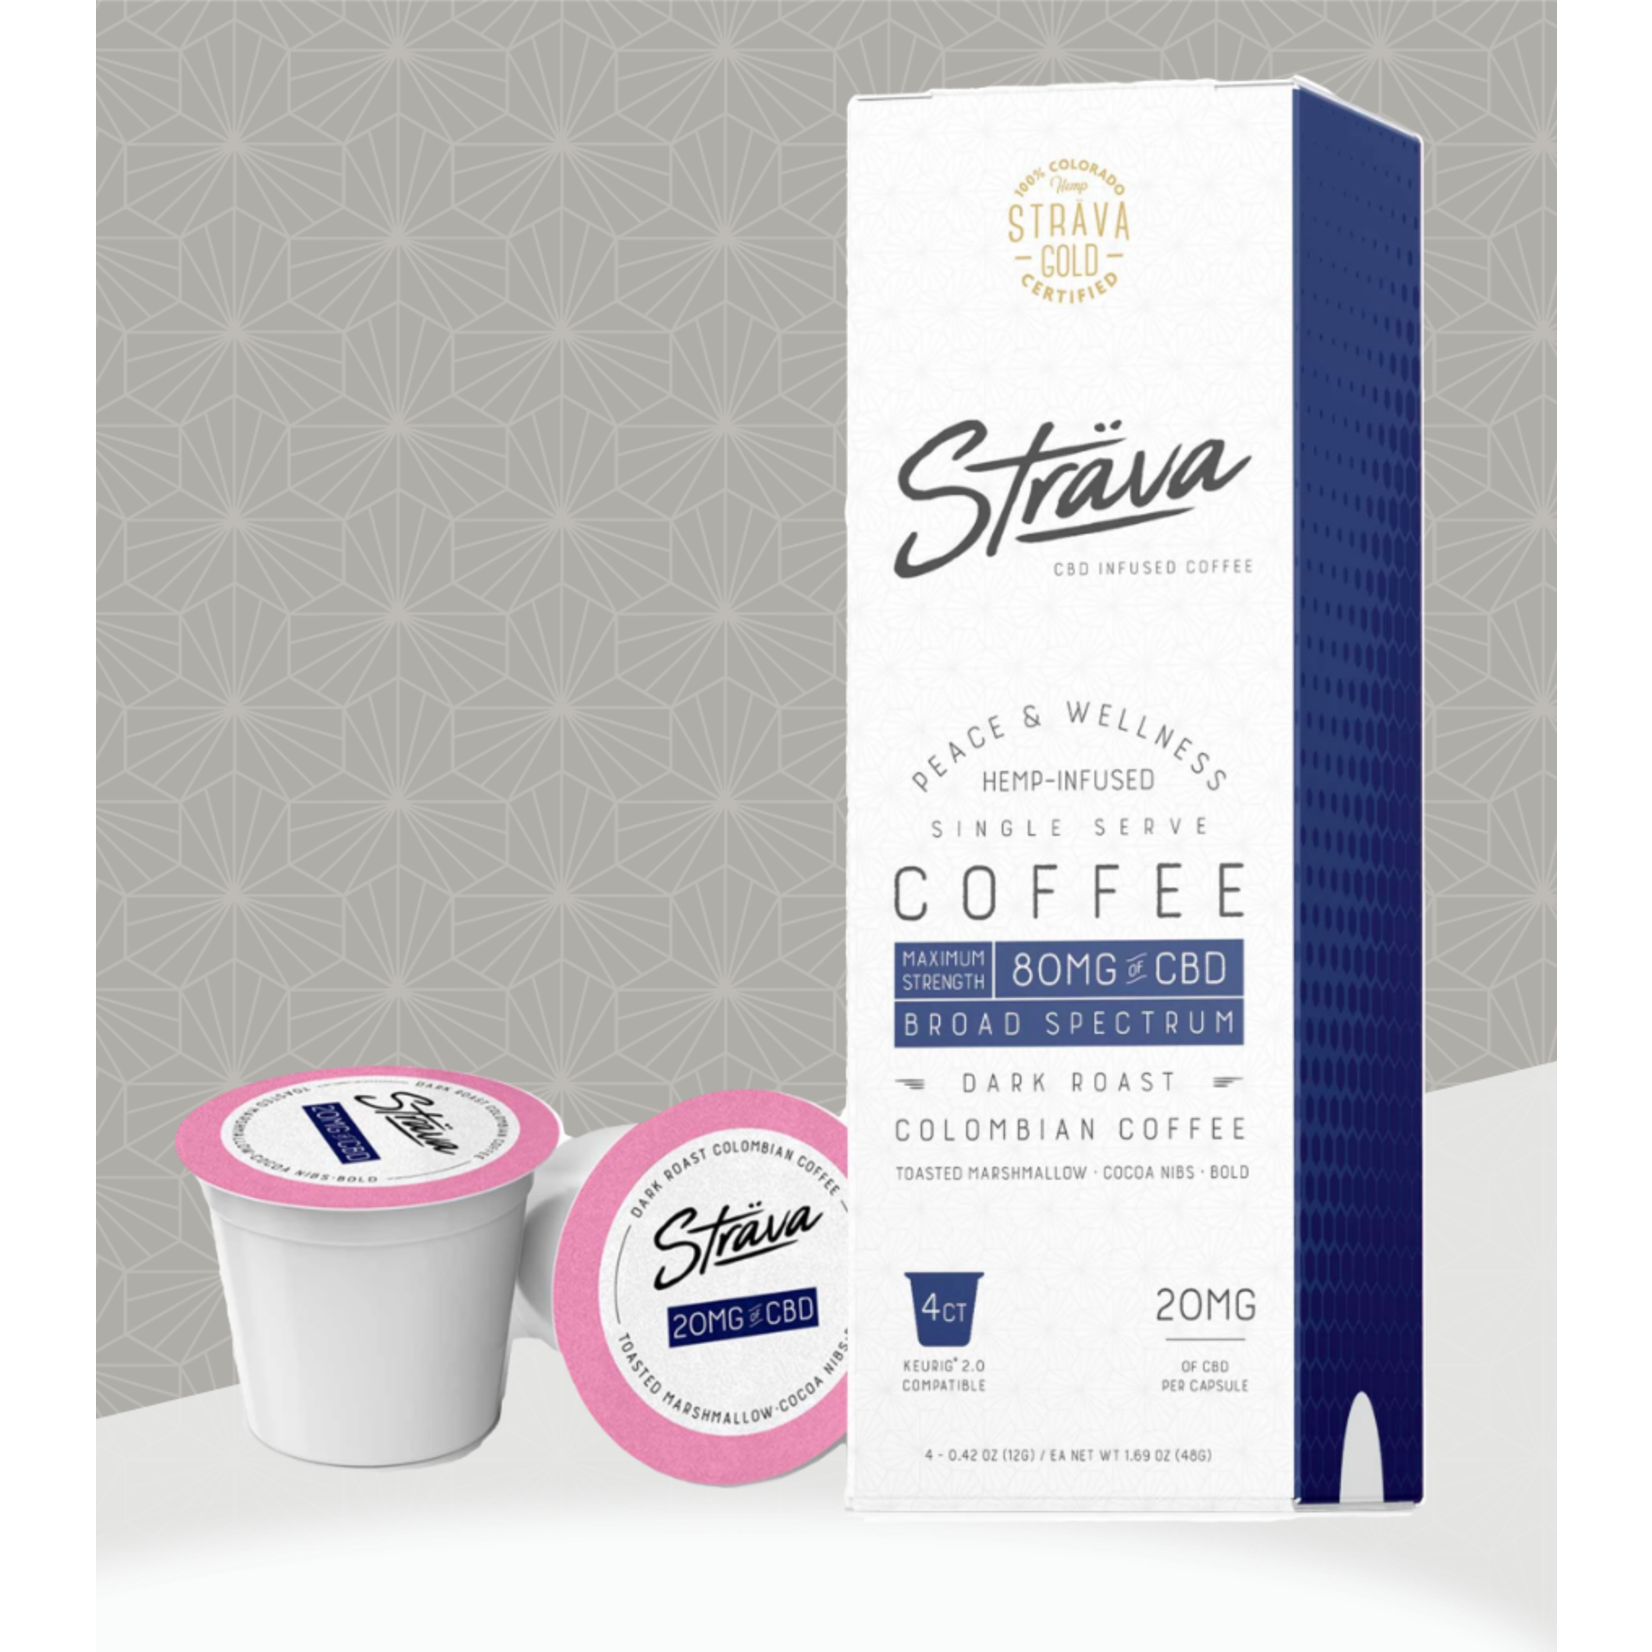 Strava Strava CBD Infused Coffee 80mg Broad Spectrum dark Roast Single Serve Keurig cup maximum Strength Columbian coffee